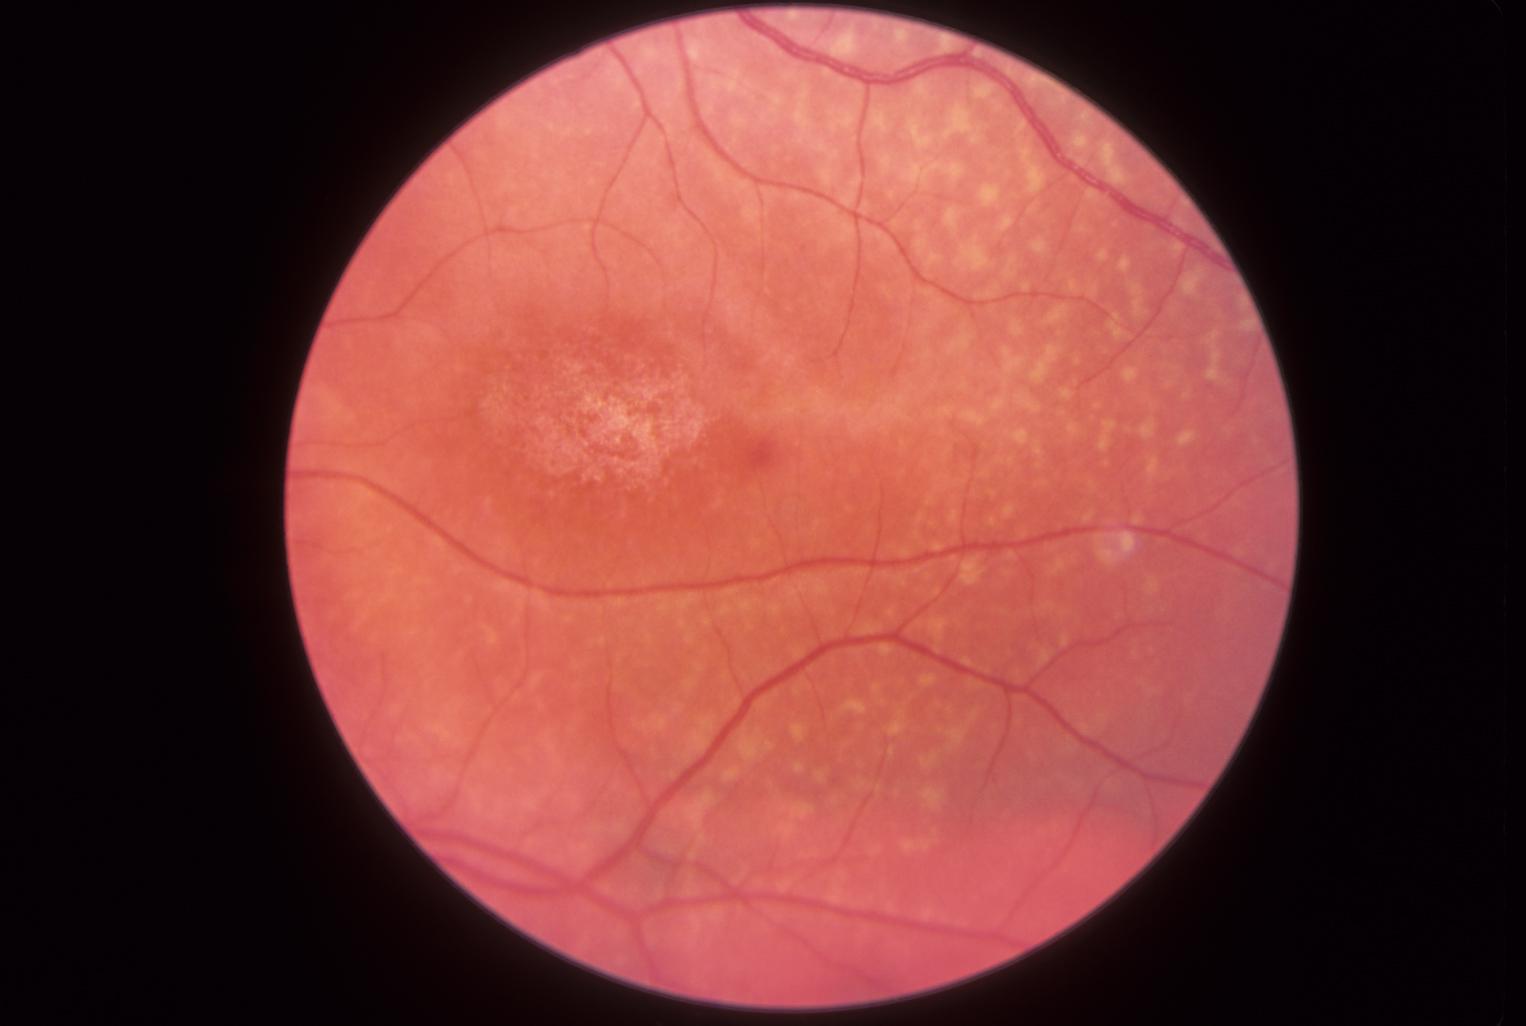 Stargardts disease